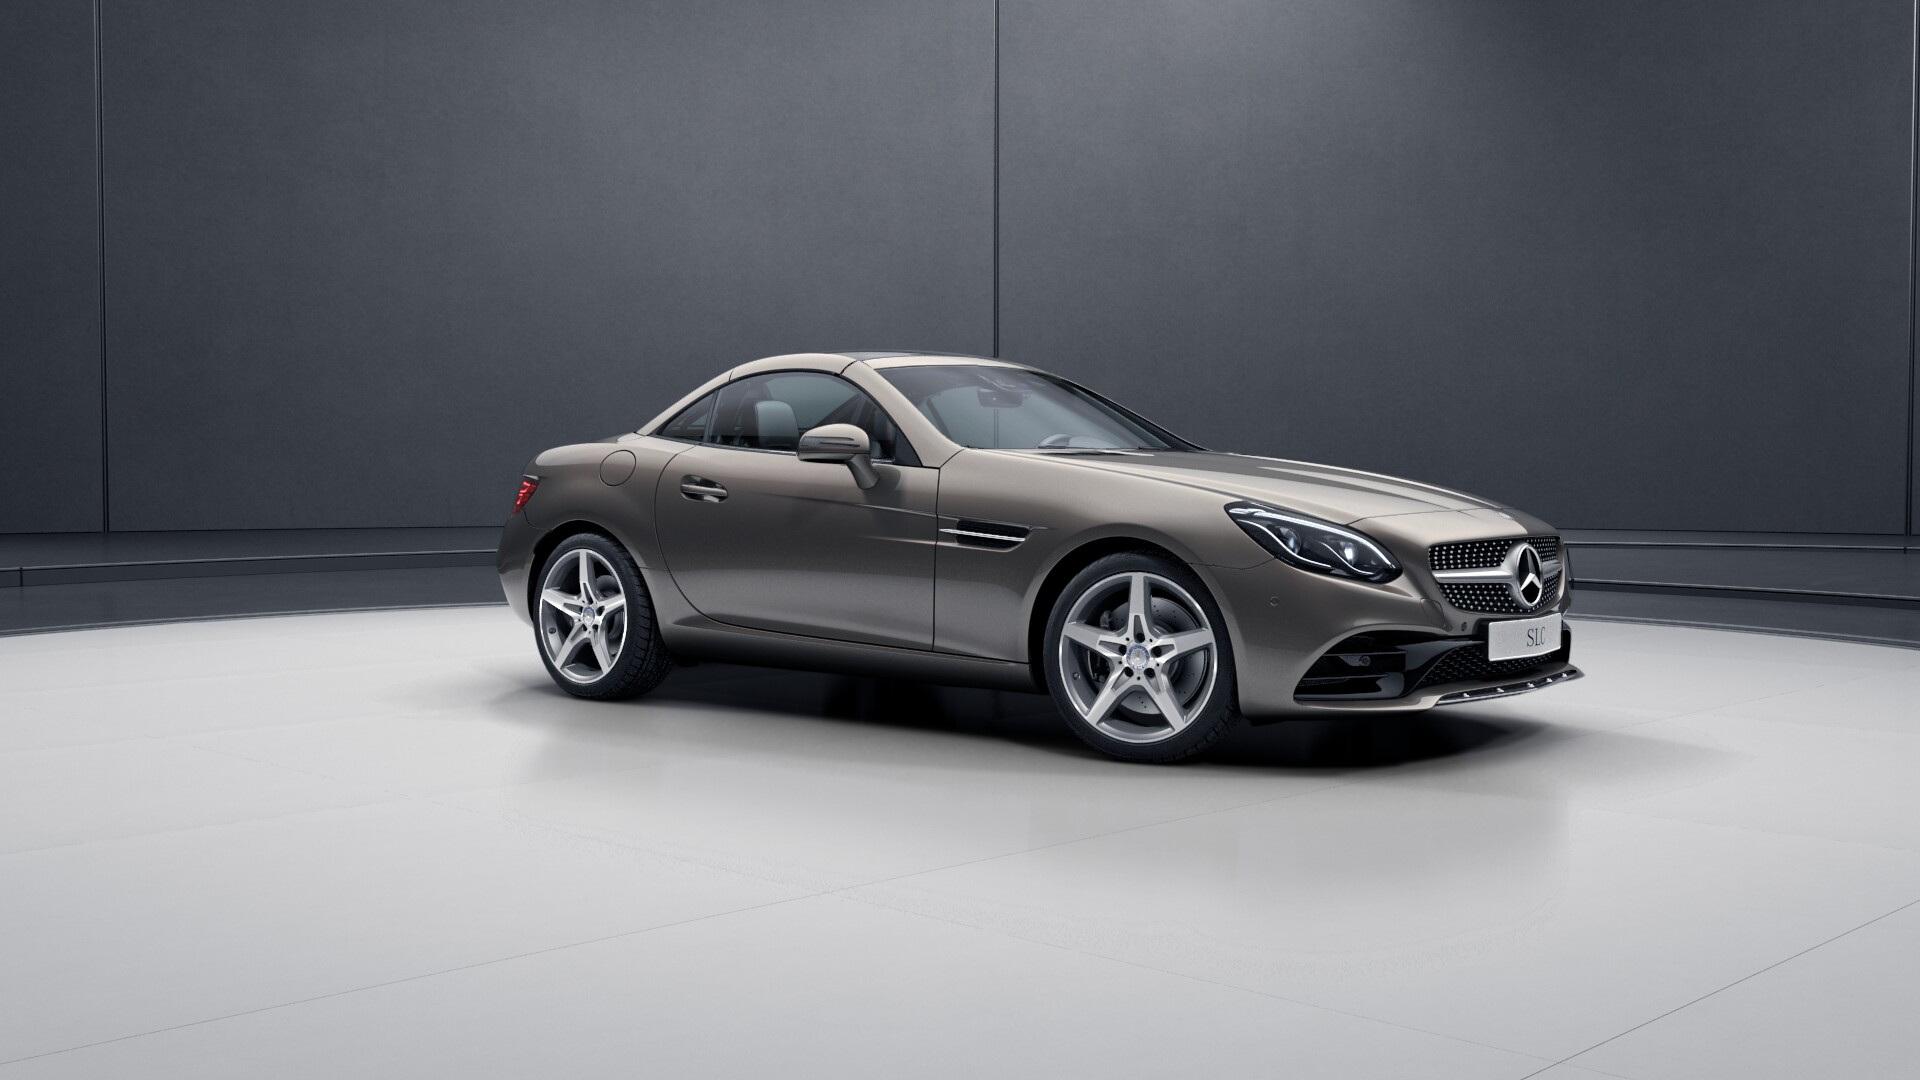 New 2017 mercedes benz slc43 amg 2 door coupe in vancouver for Mercedes benz vancouver